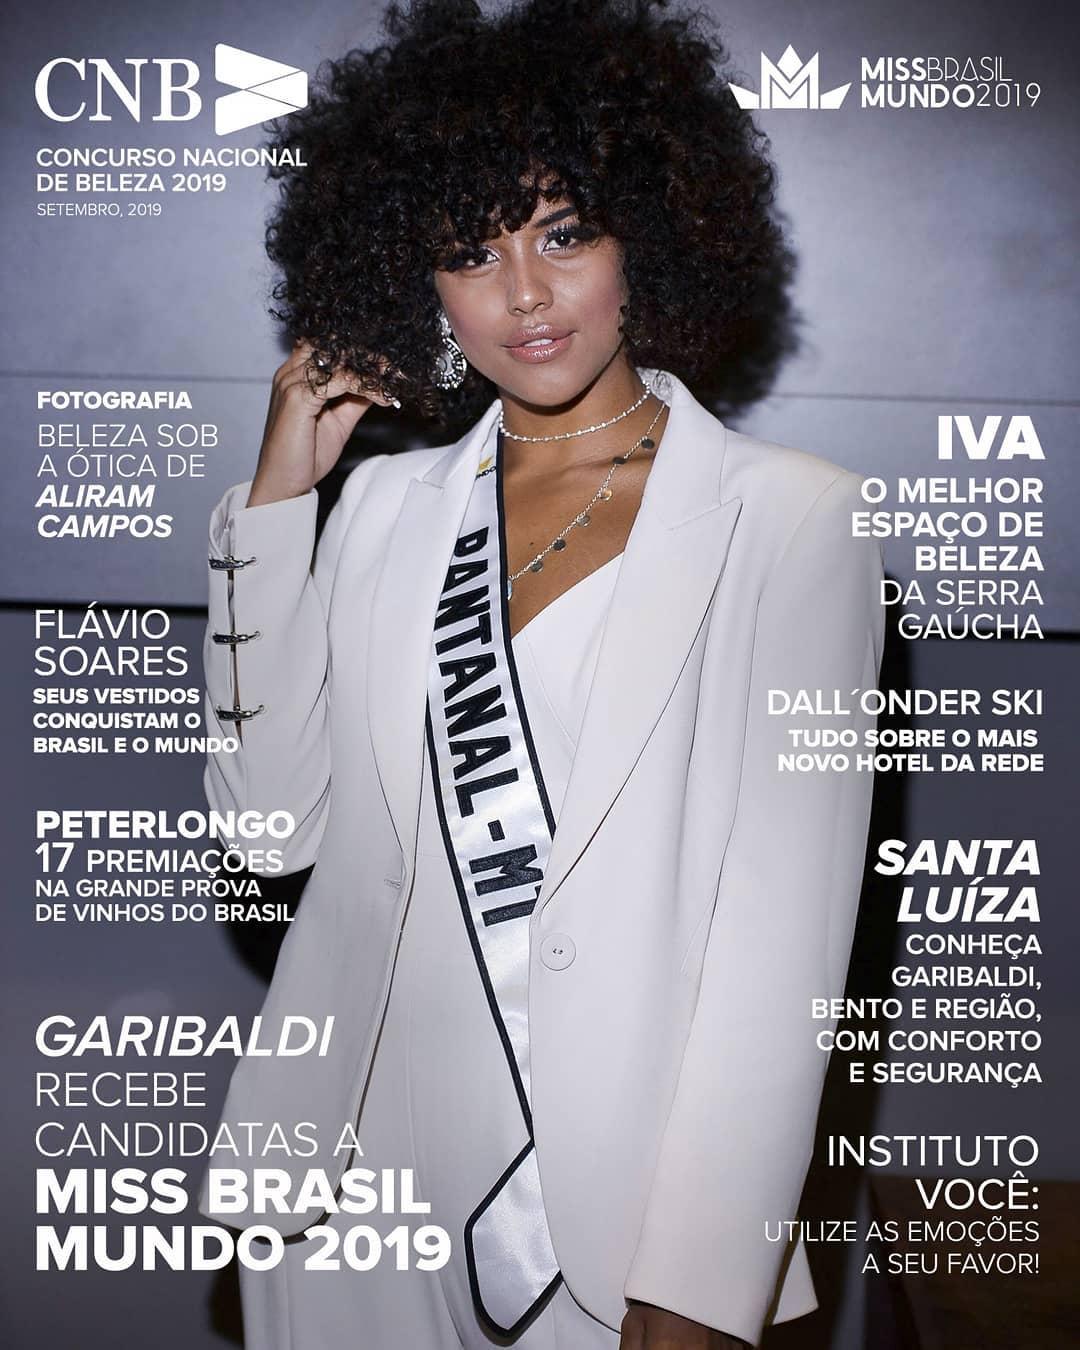 thayna mello, miss pantanal matogrossense mundo 2019. 20497111